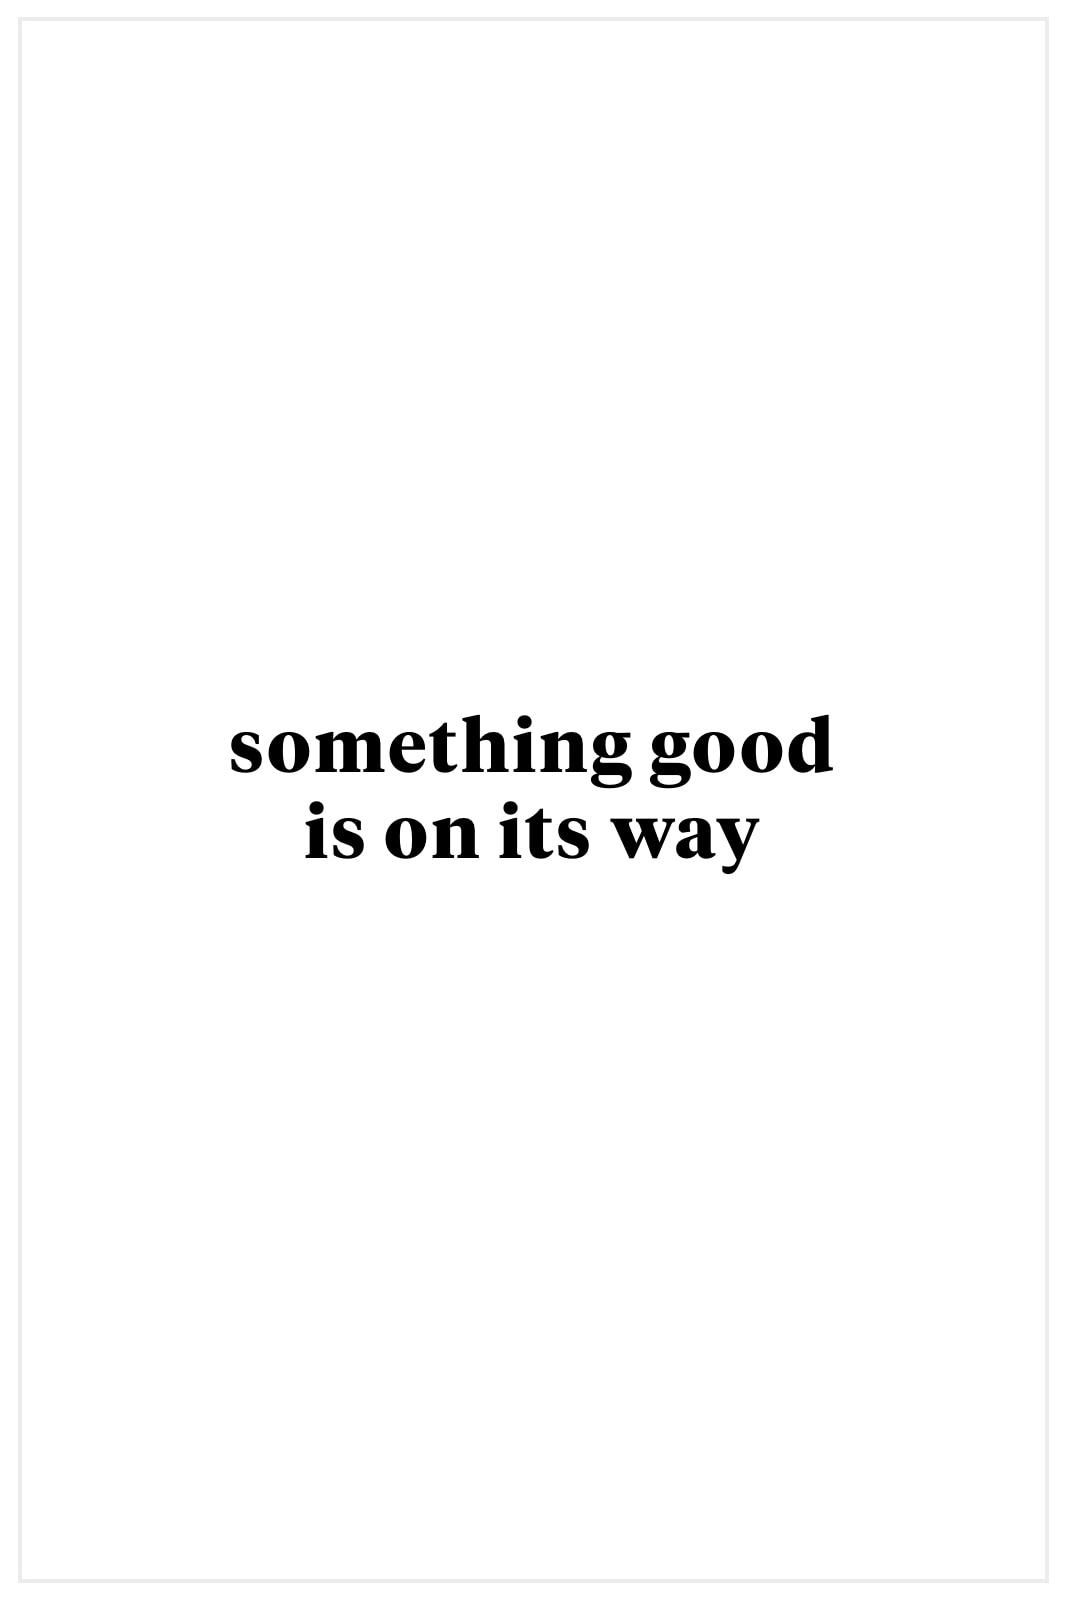 Peyton jensen Stripe Sweater Tunic Tank